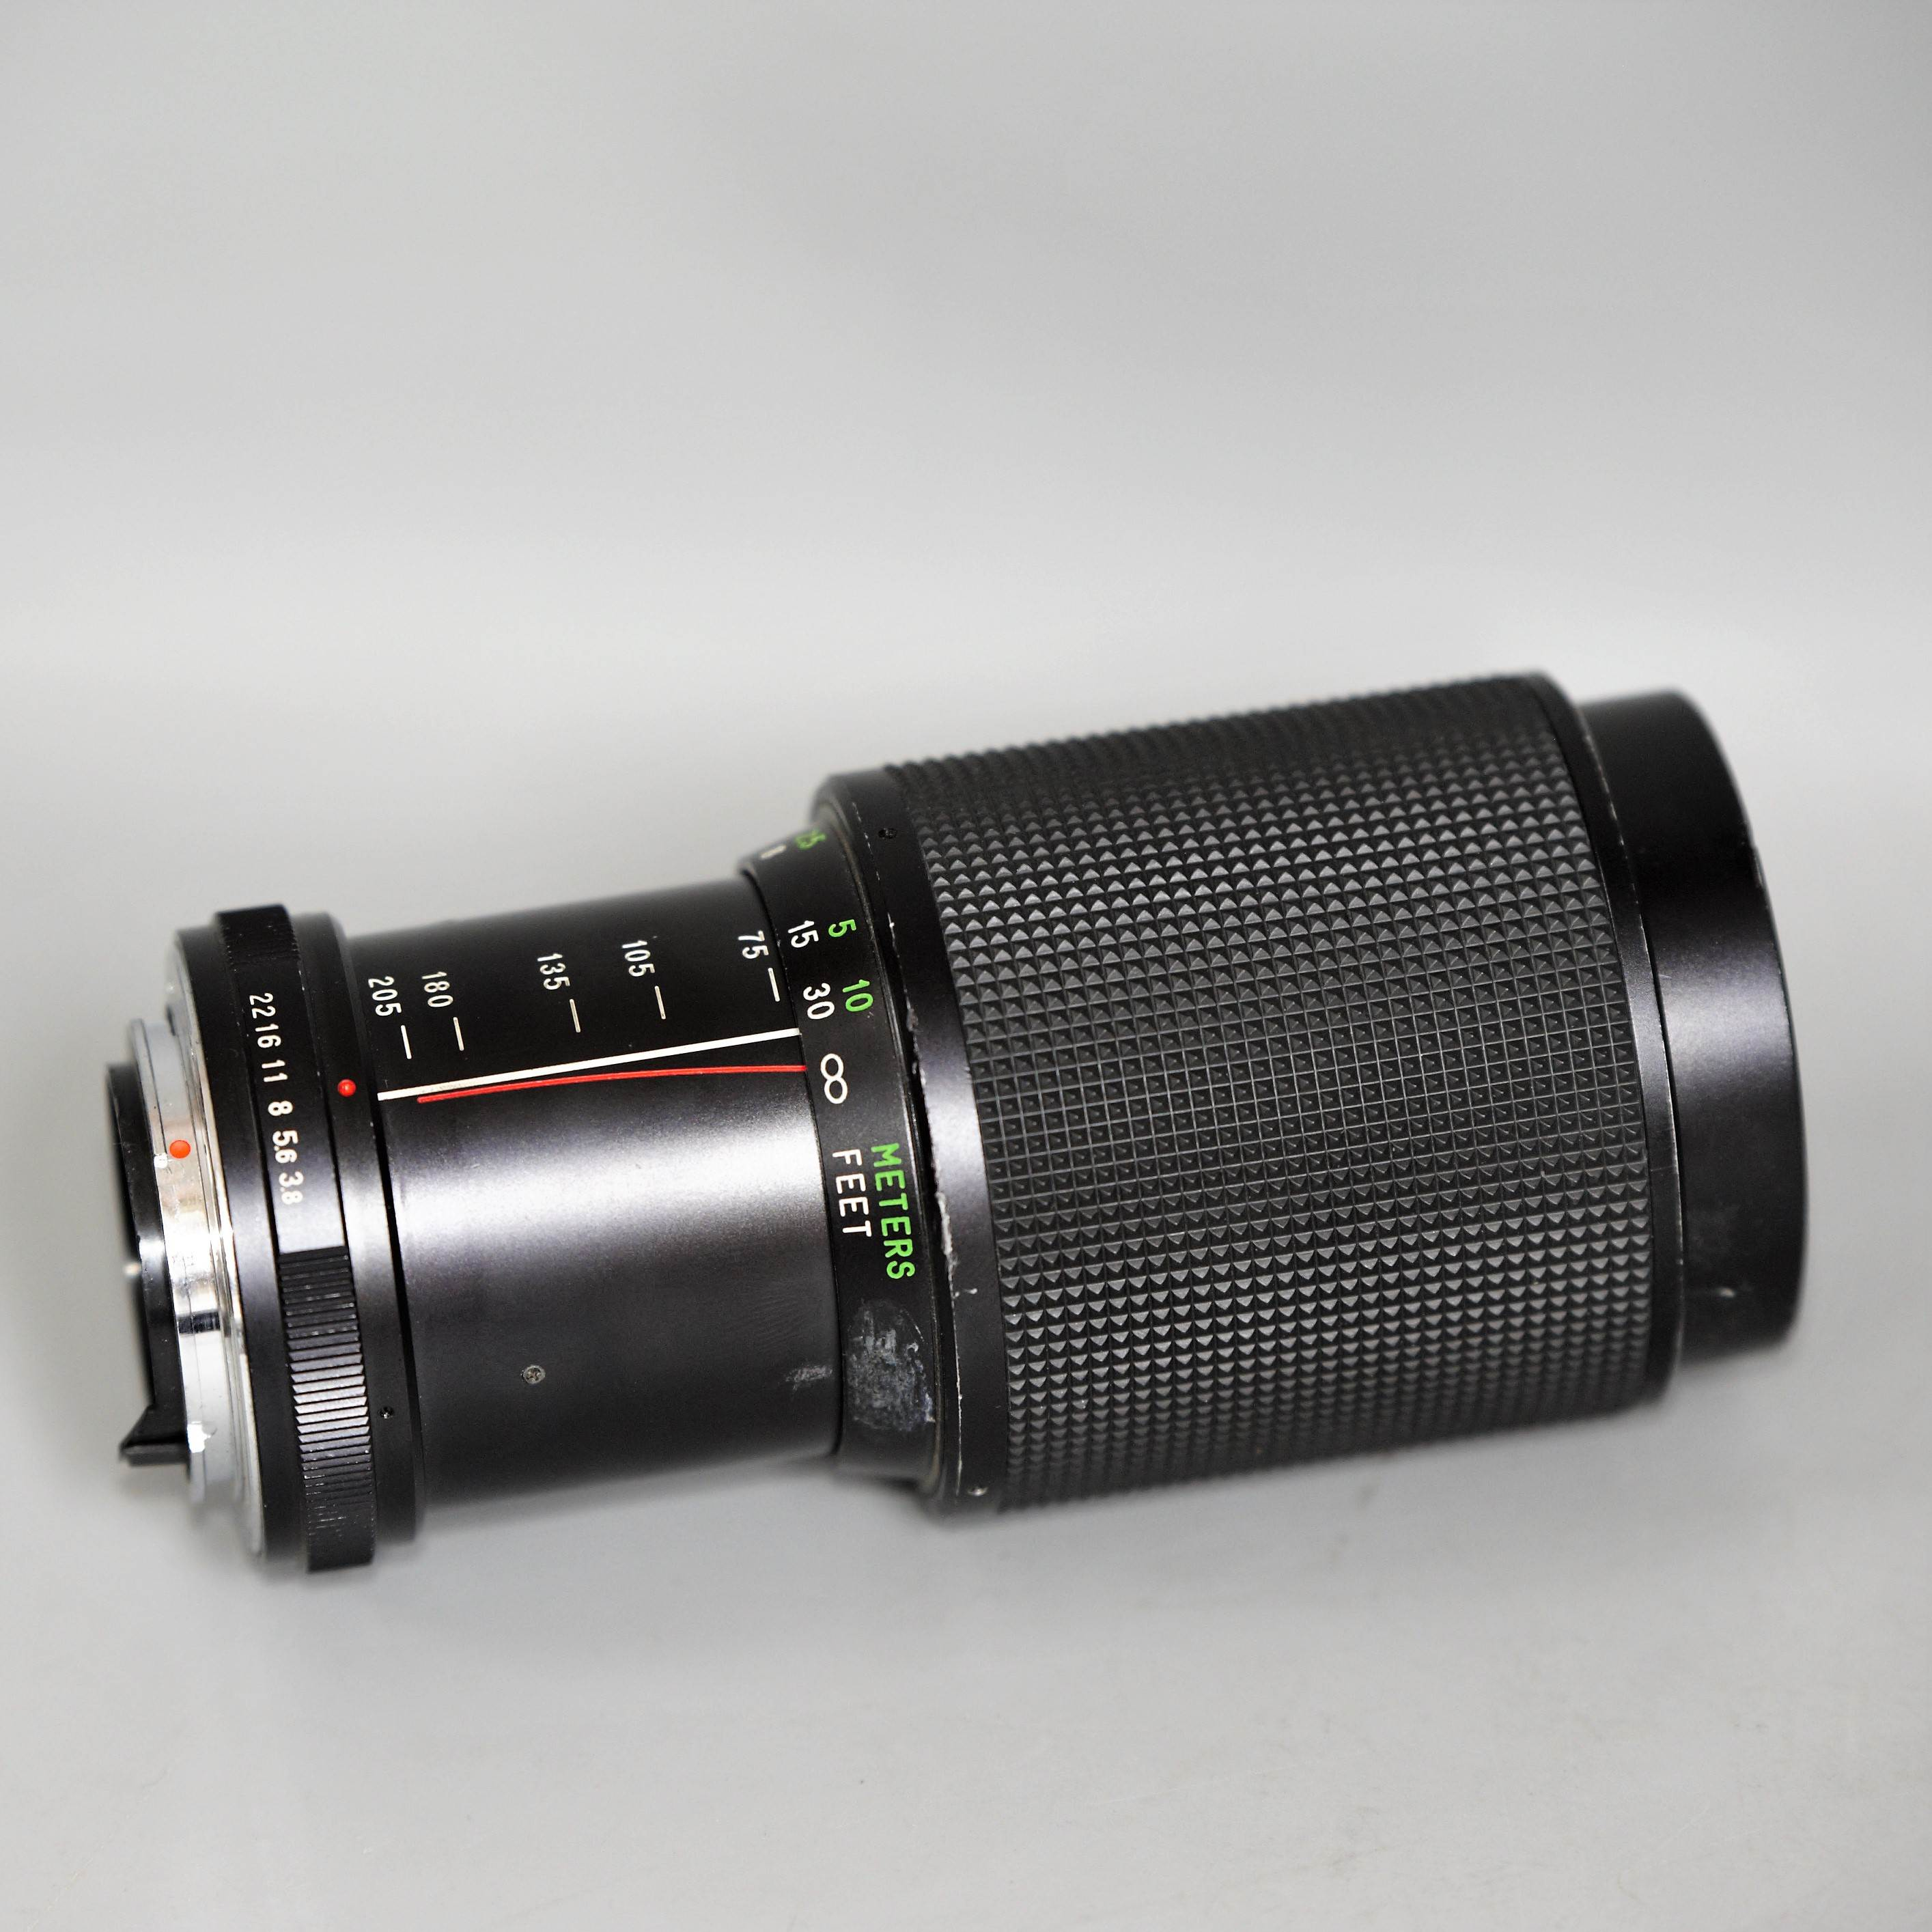 vivitar-75-205mm-f3-8-mc-macro-mf-pentax-75-205-3-8-11303